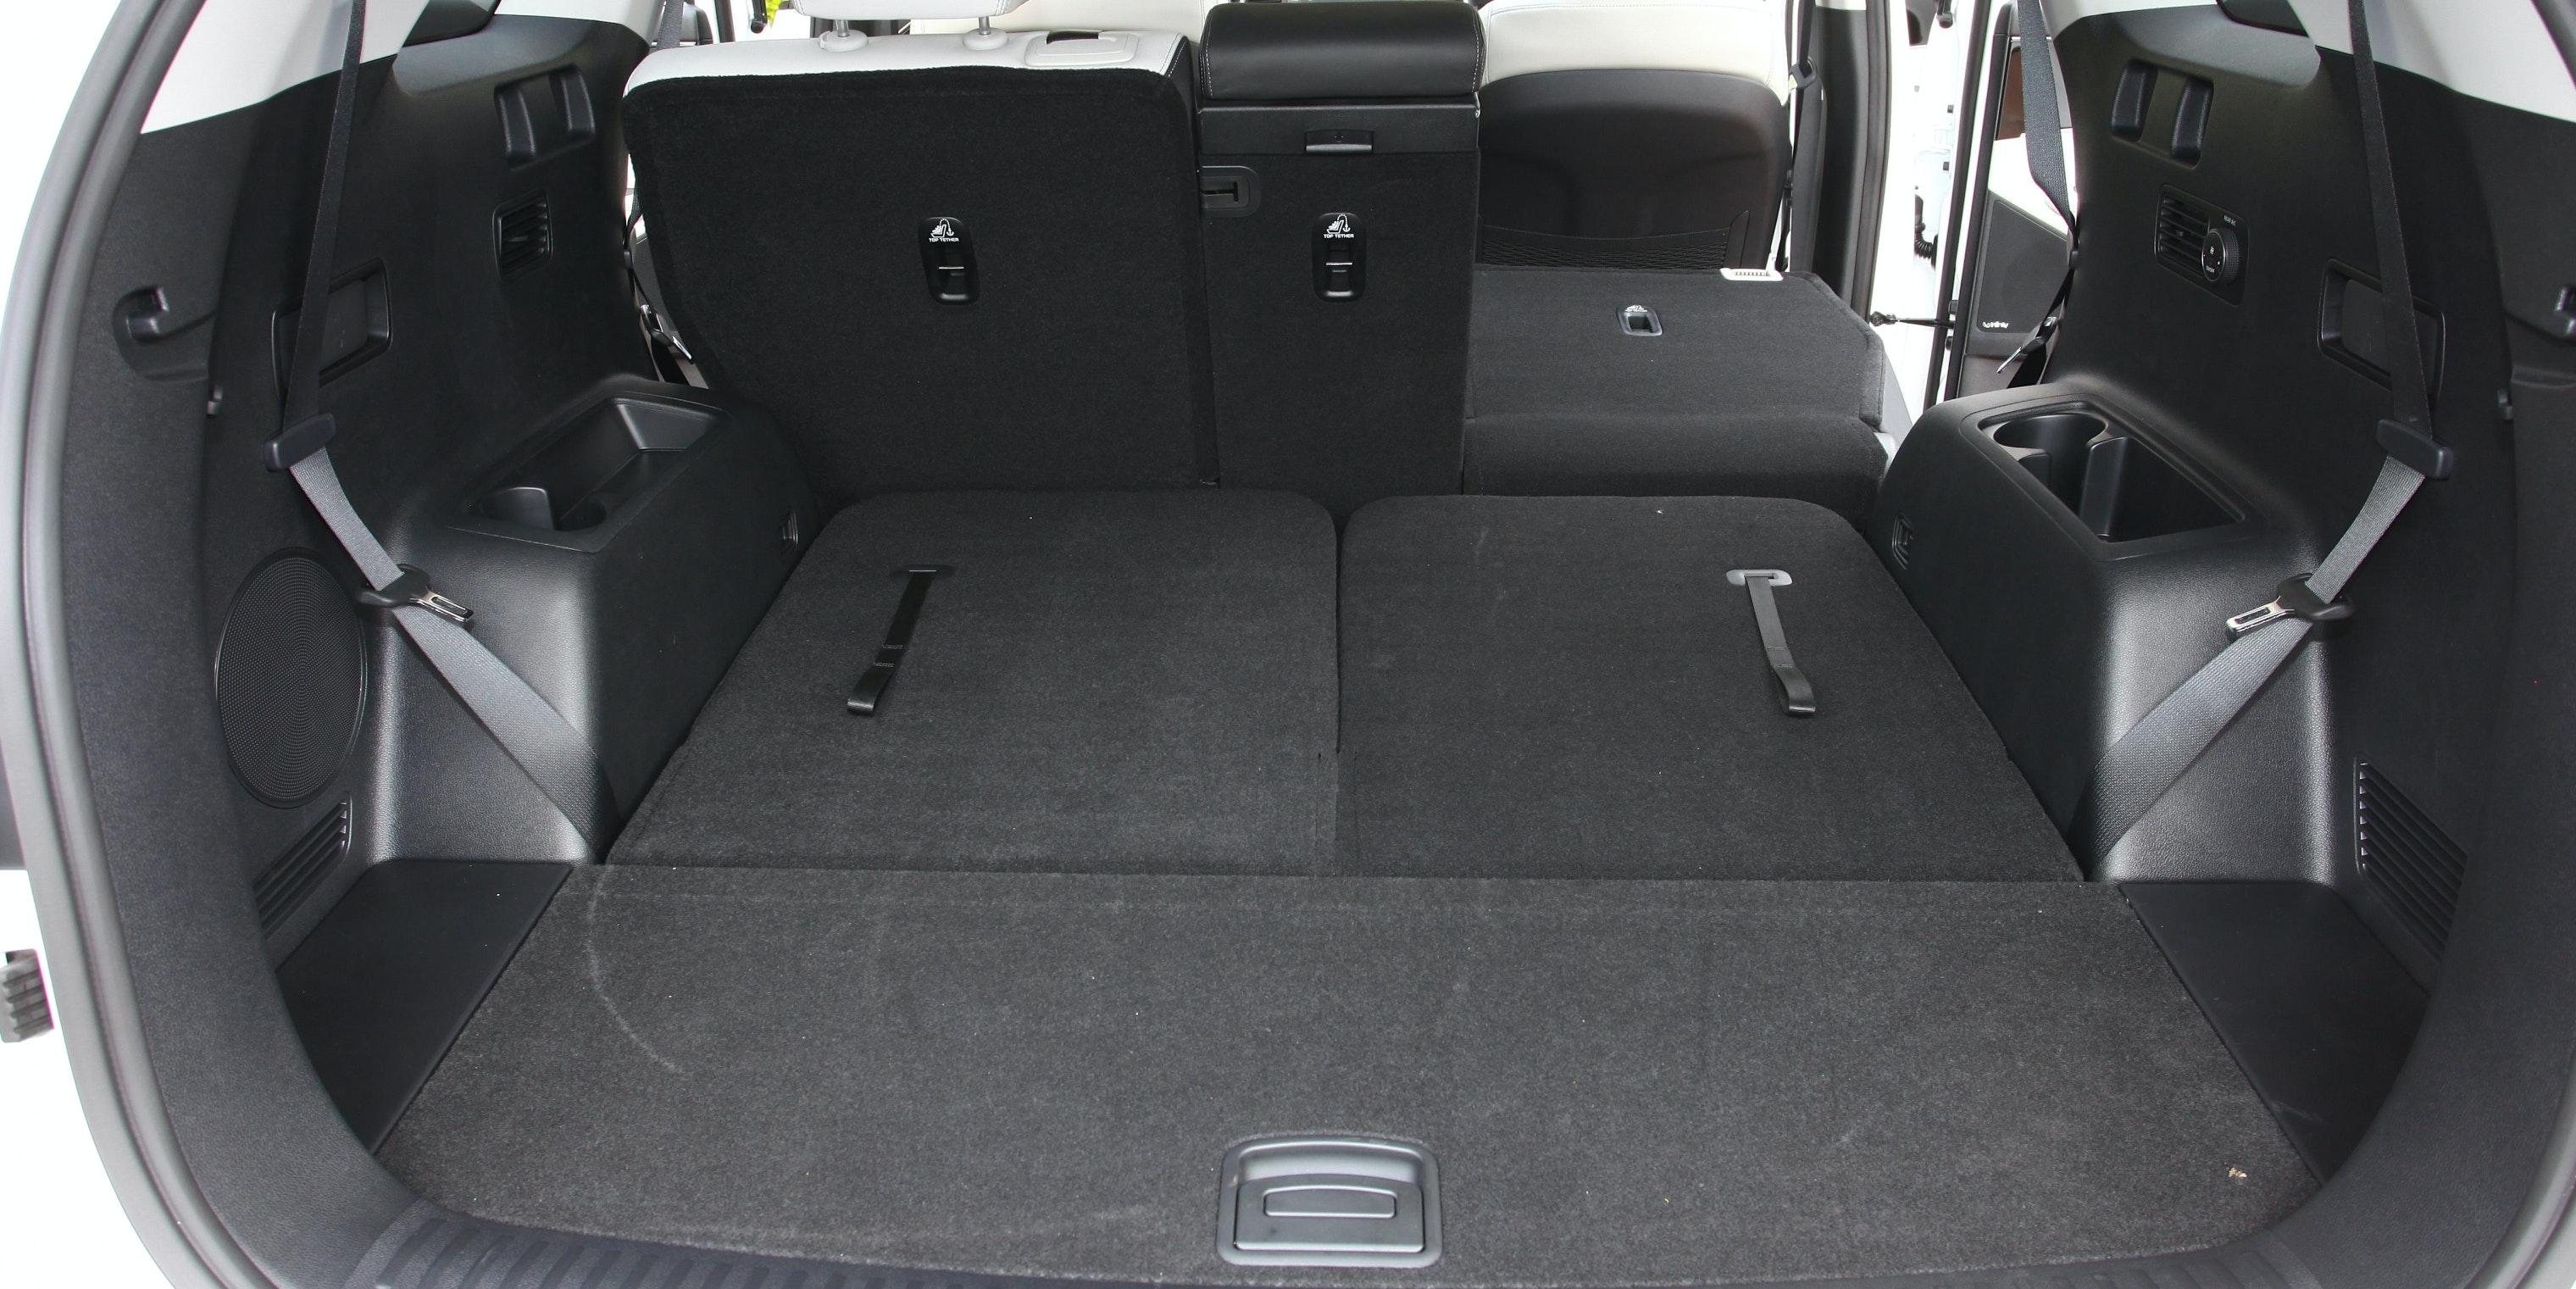 Service Manual 2007 Kia Sorento Back Seat Removable Service Manual 2011 Kia Sportage Rear